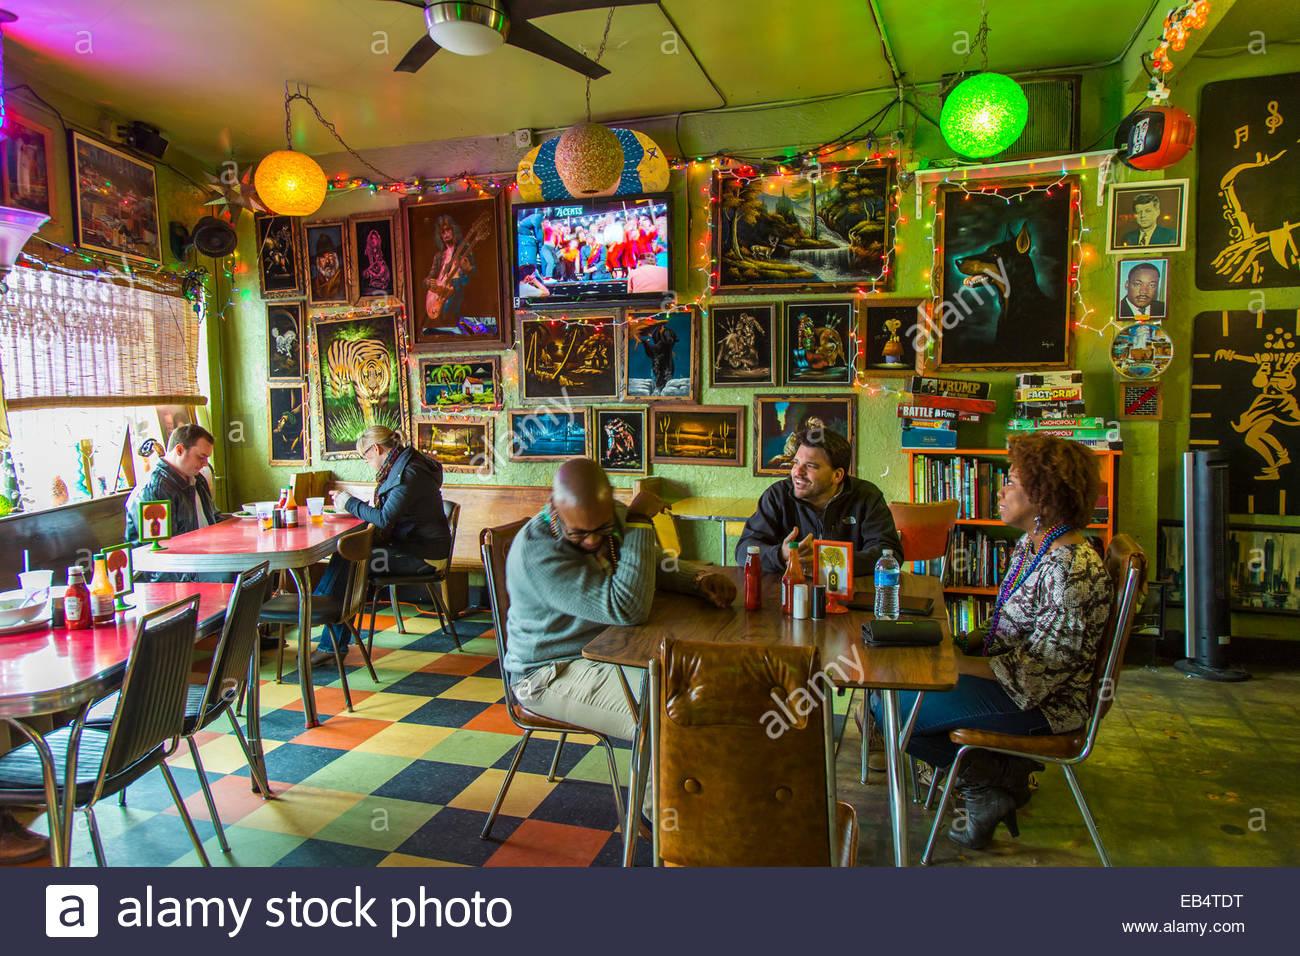 The Bottletree restaurant brings vegan and regular fare and live music to Birmingham's Avondale neighborhood. - Stock Image